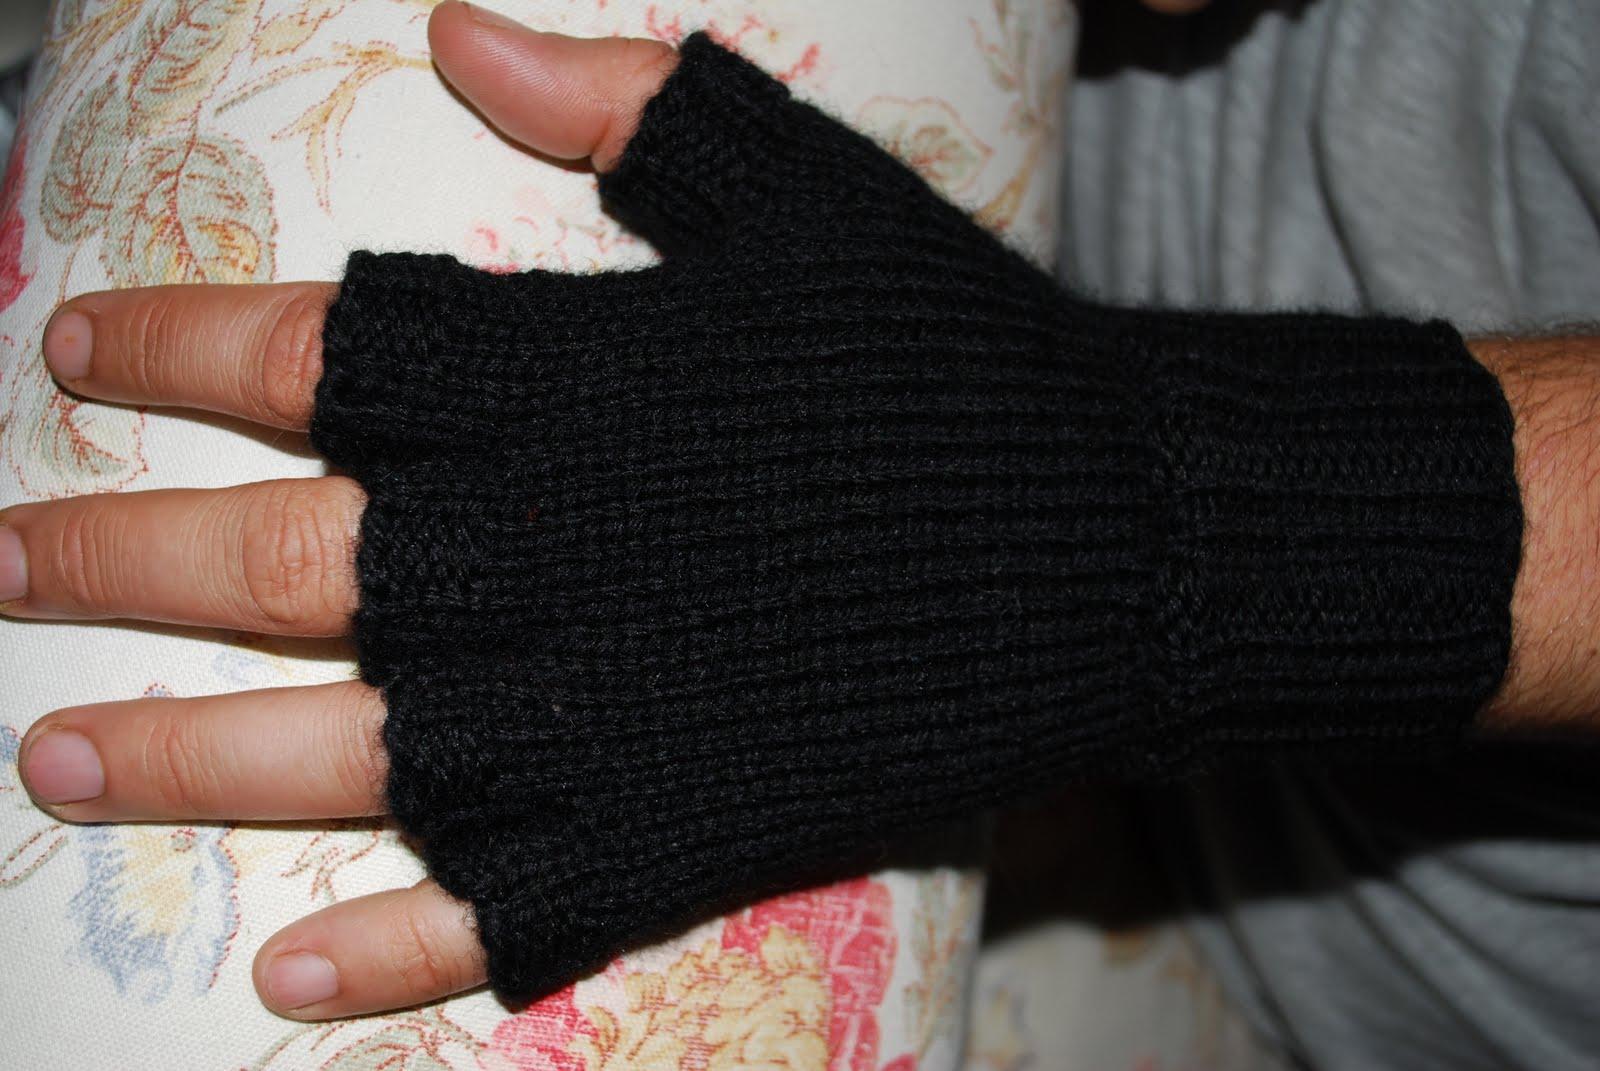 Fingervantar utan fingrar